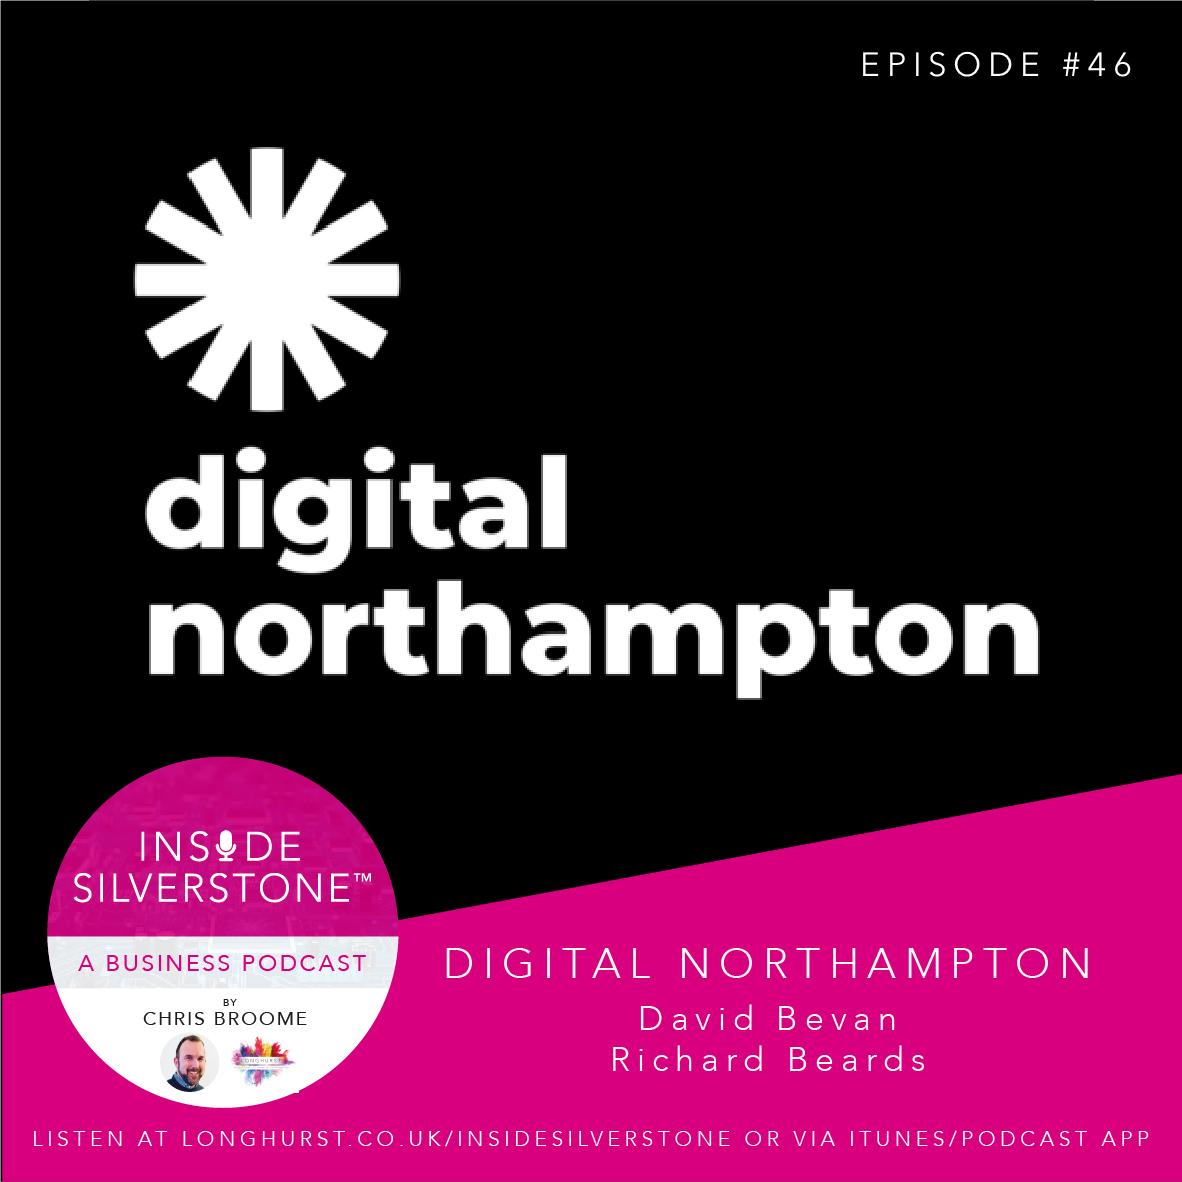 David Bevan and Richard Beards from Digital Northampton